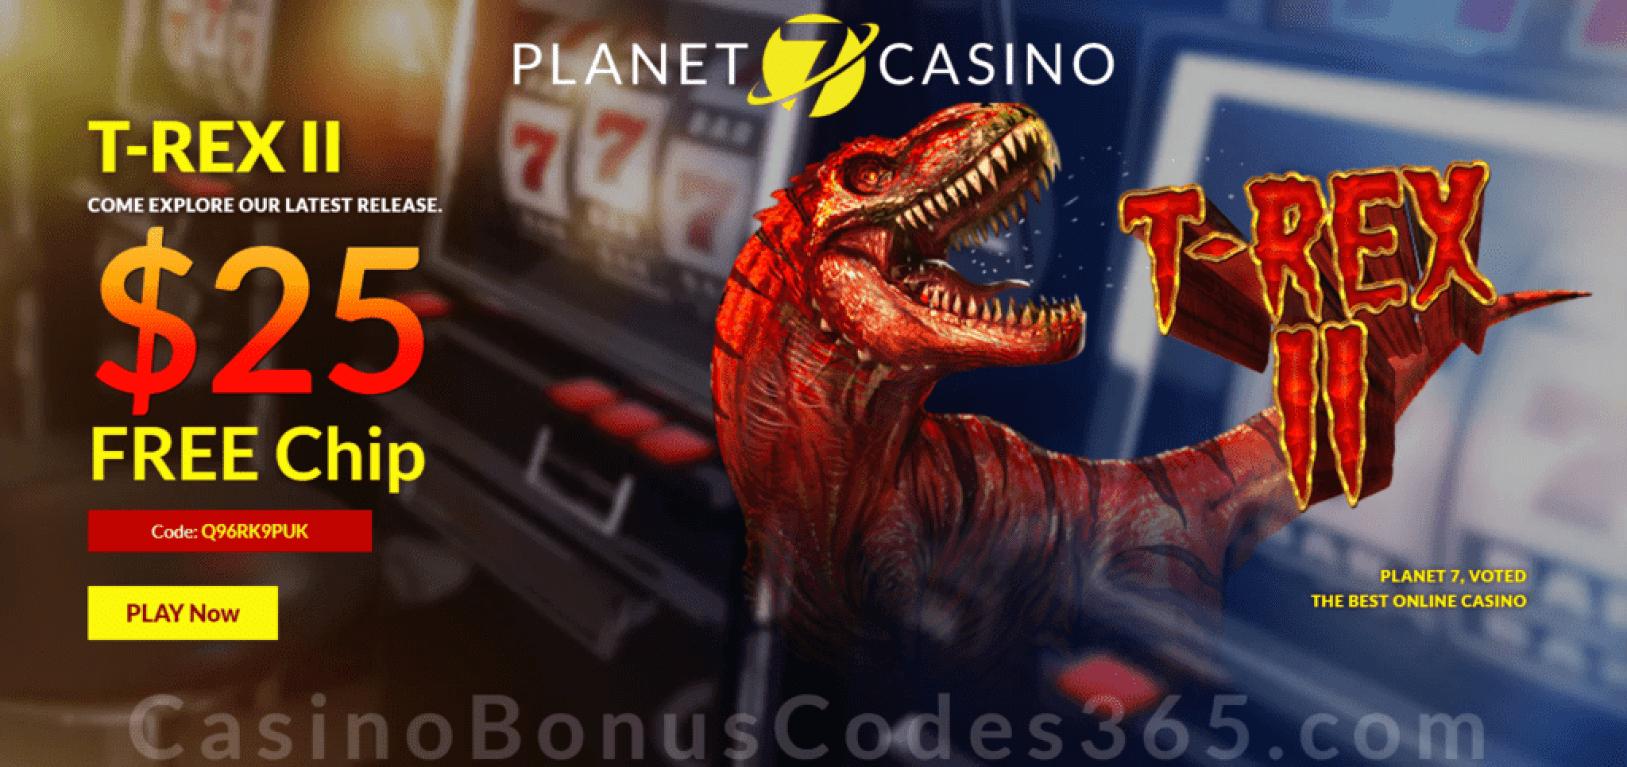 Planet 7 Casino $25 No Deposit FREE Chip Special Deal RTG T-Rex II